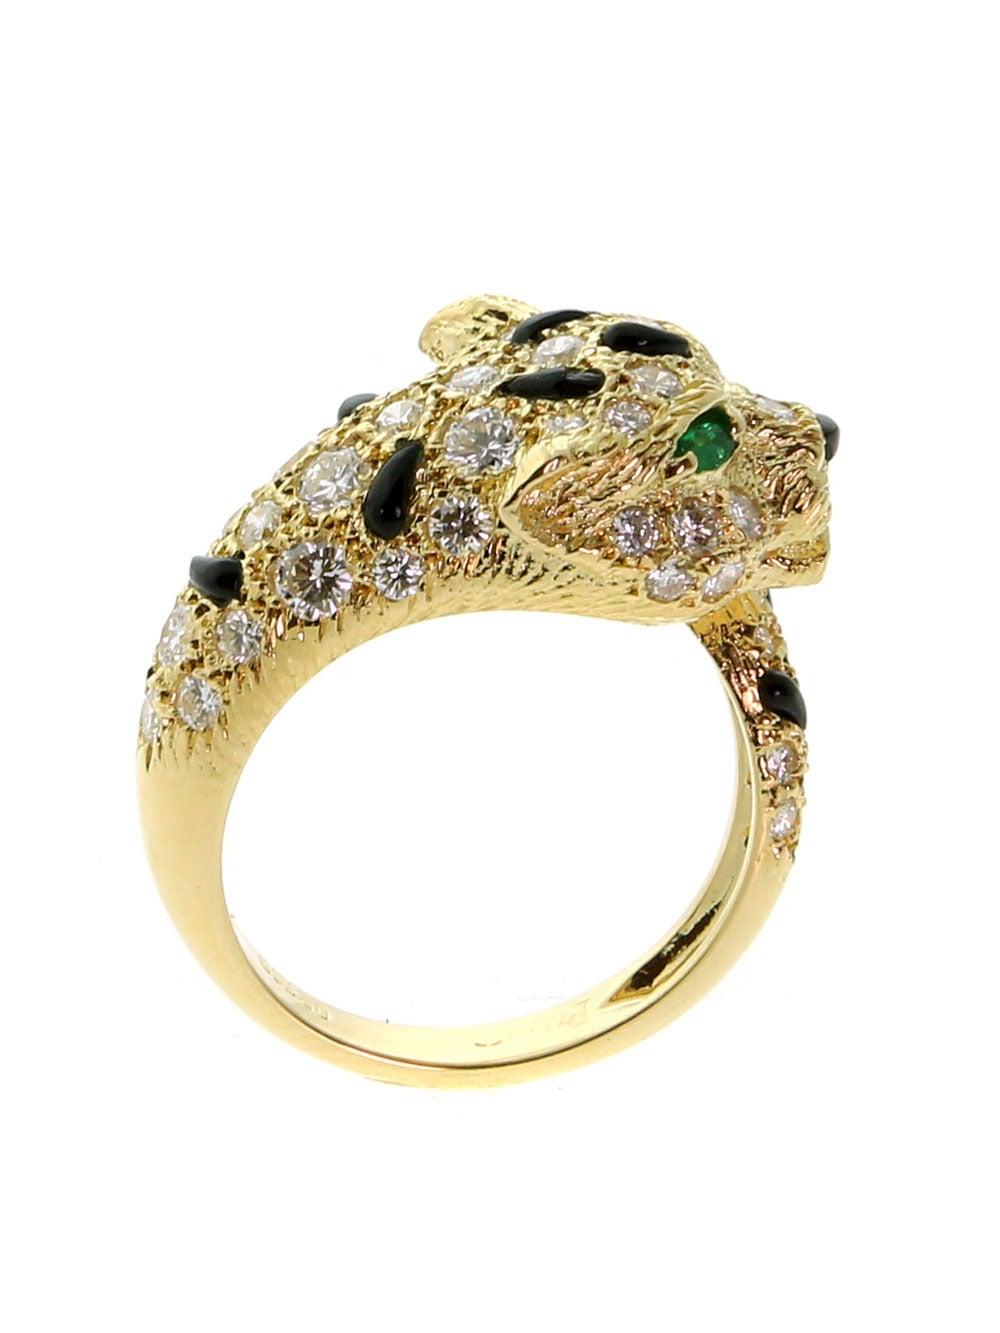 Piaget Panthere Emerald Onyx Diamond Gold Ring 4